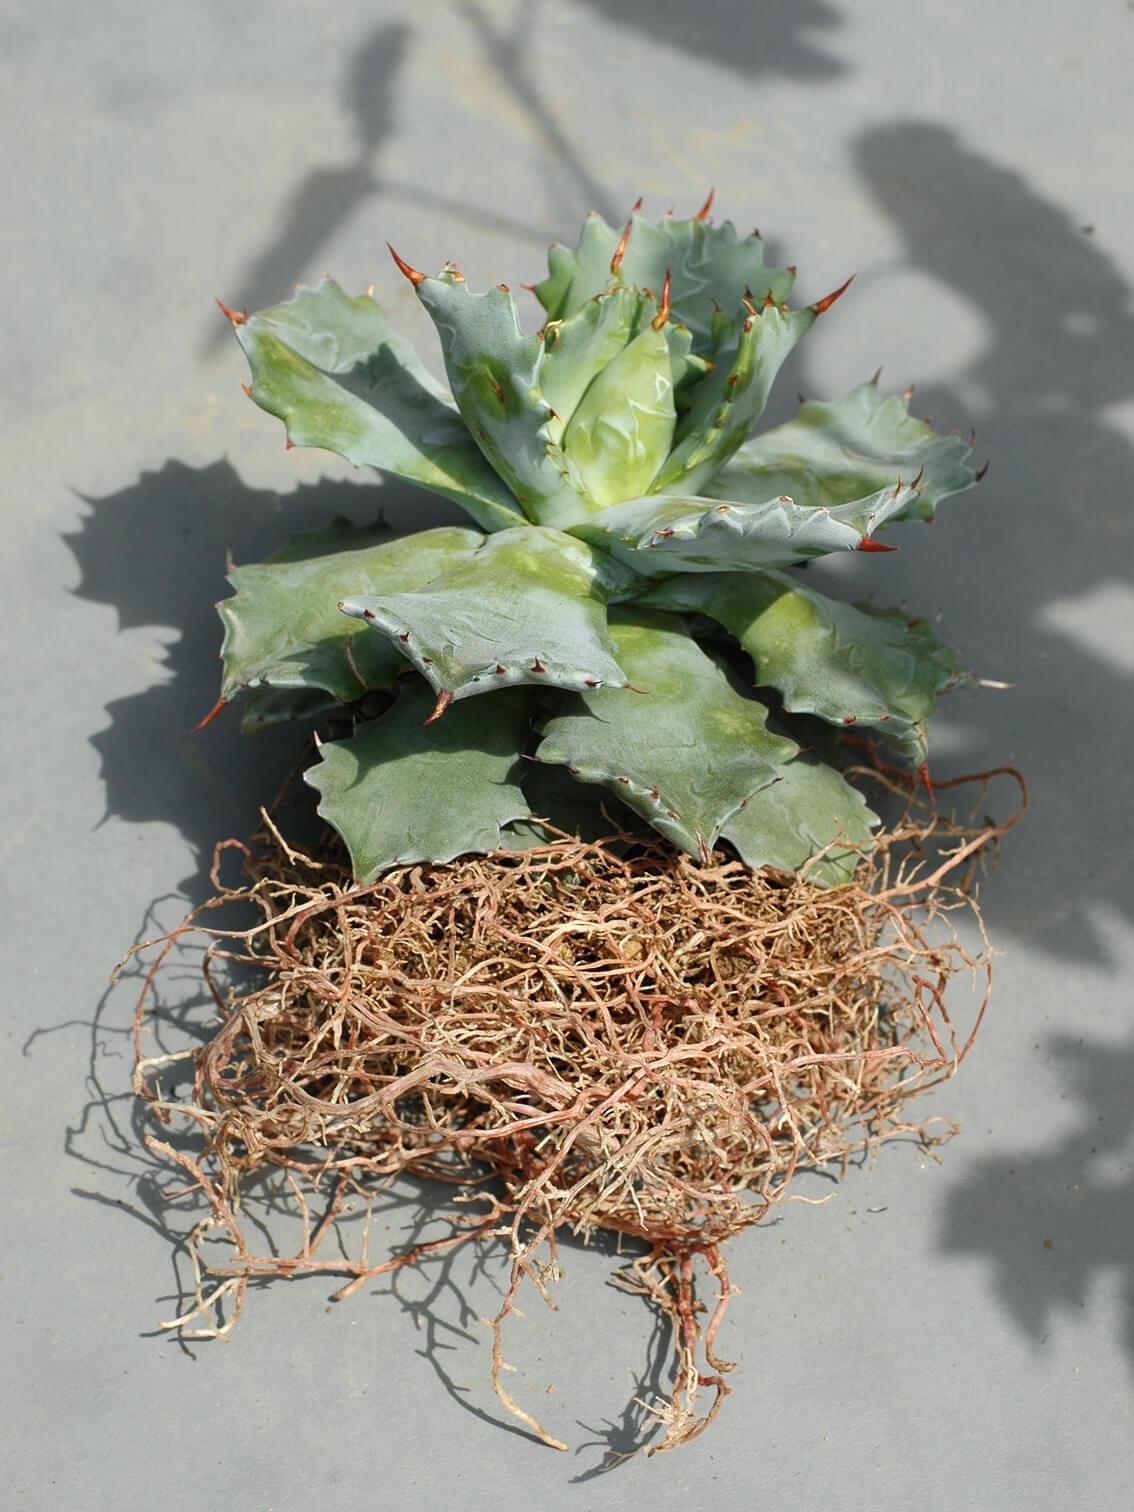 agave-potatorum-raijin-may-2020-02.jpg